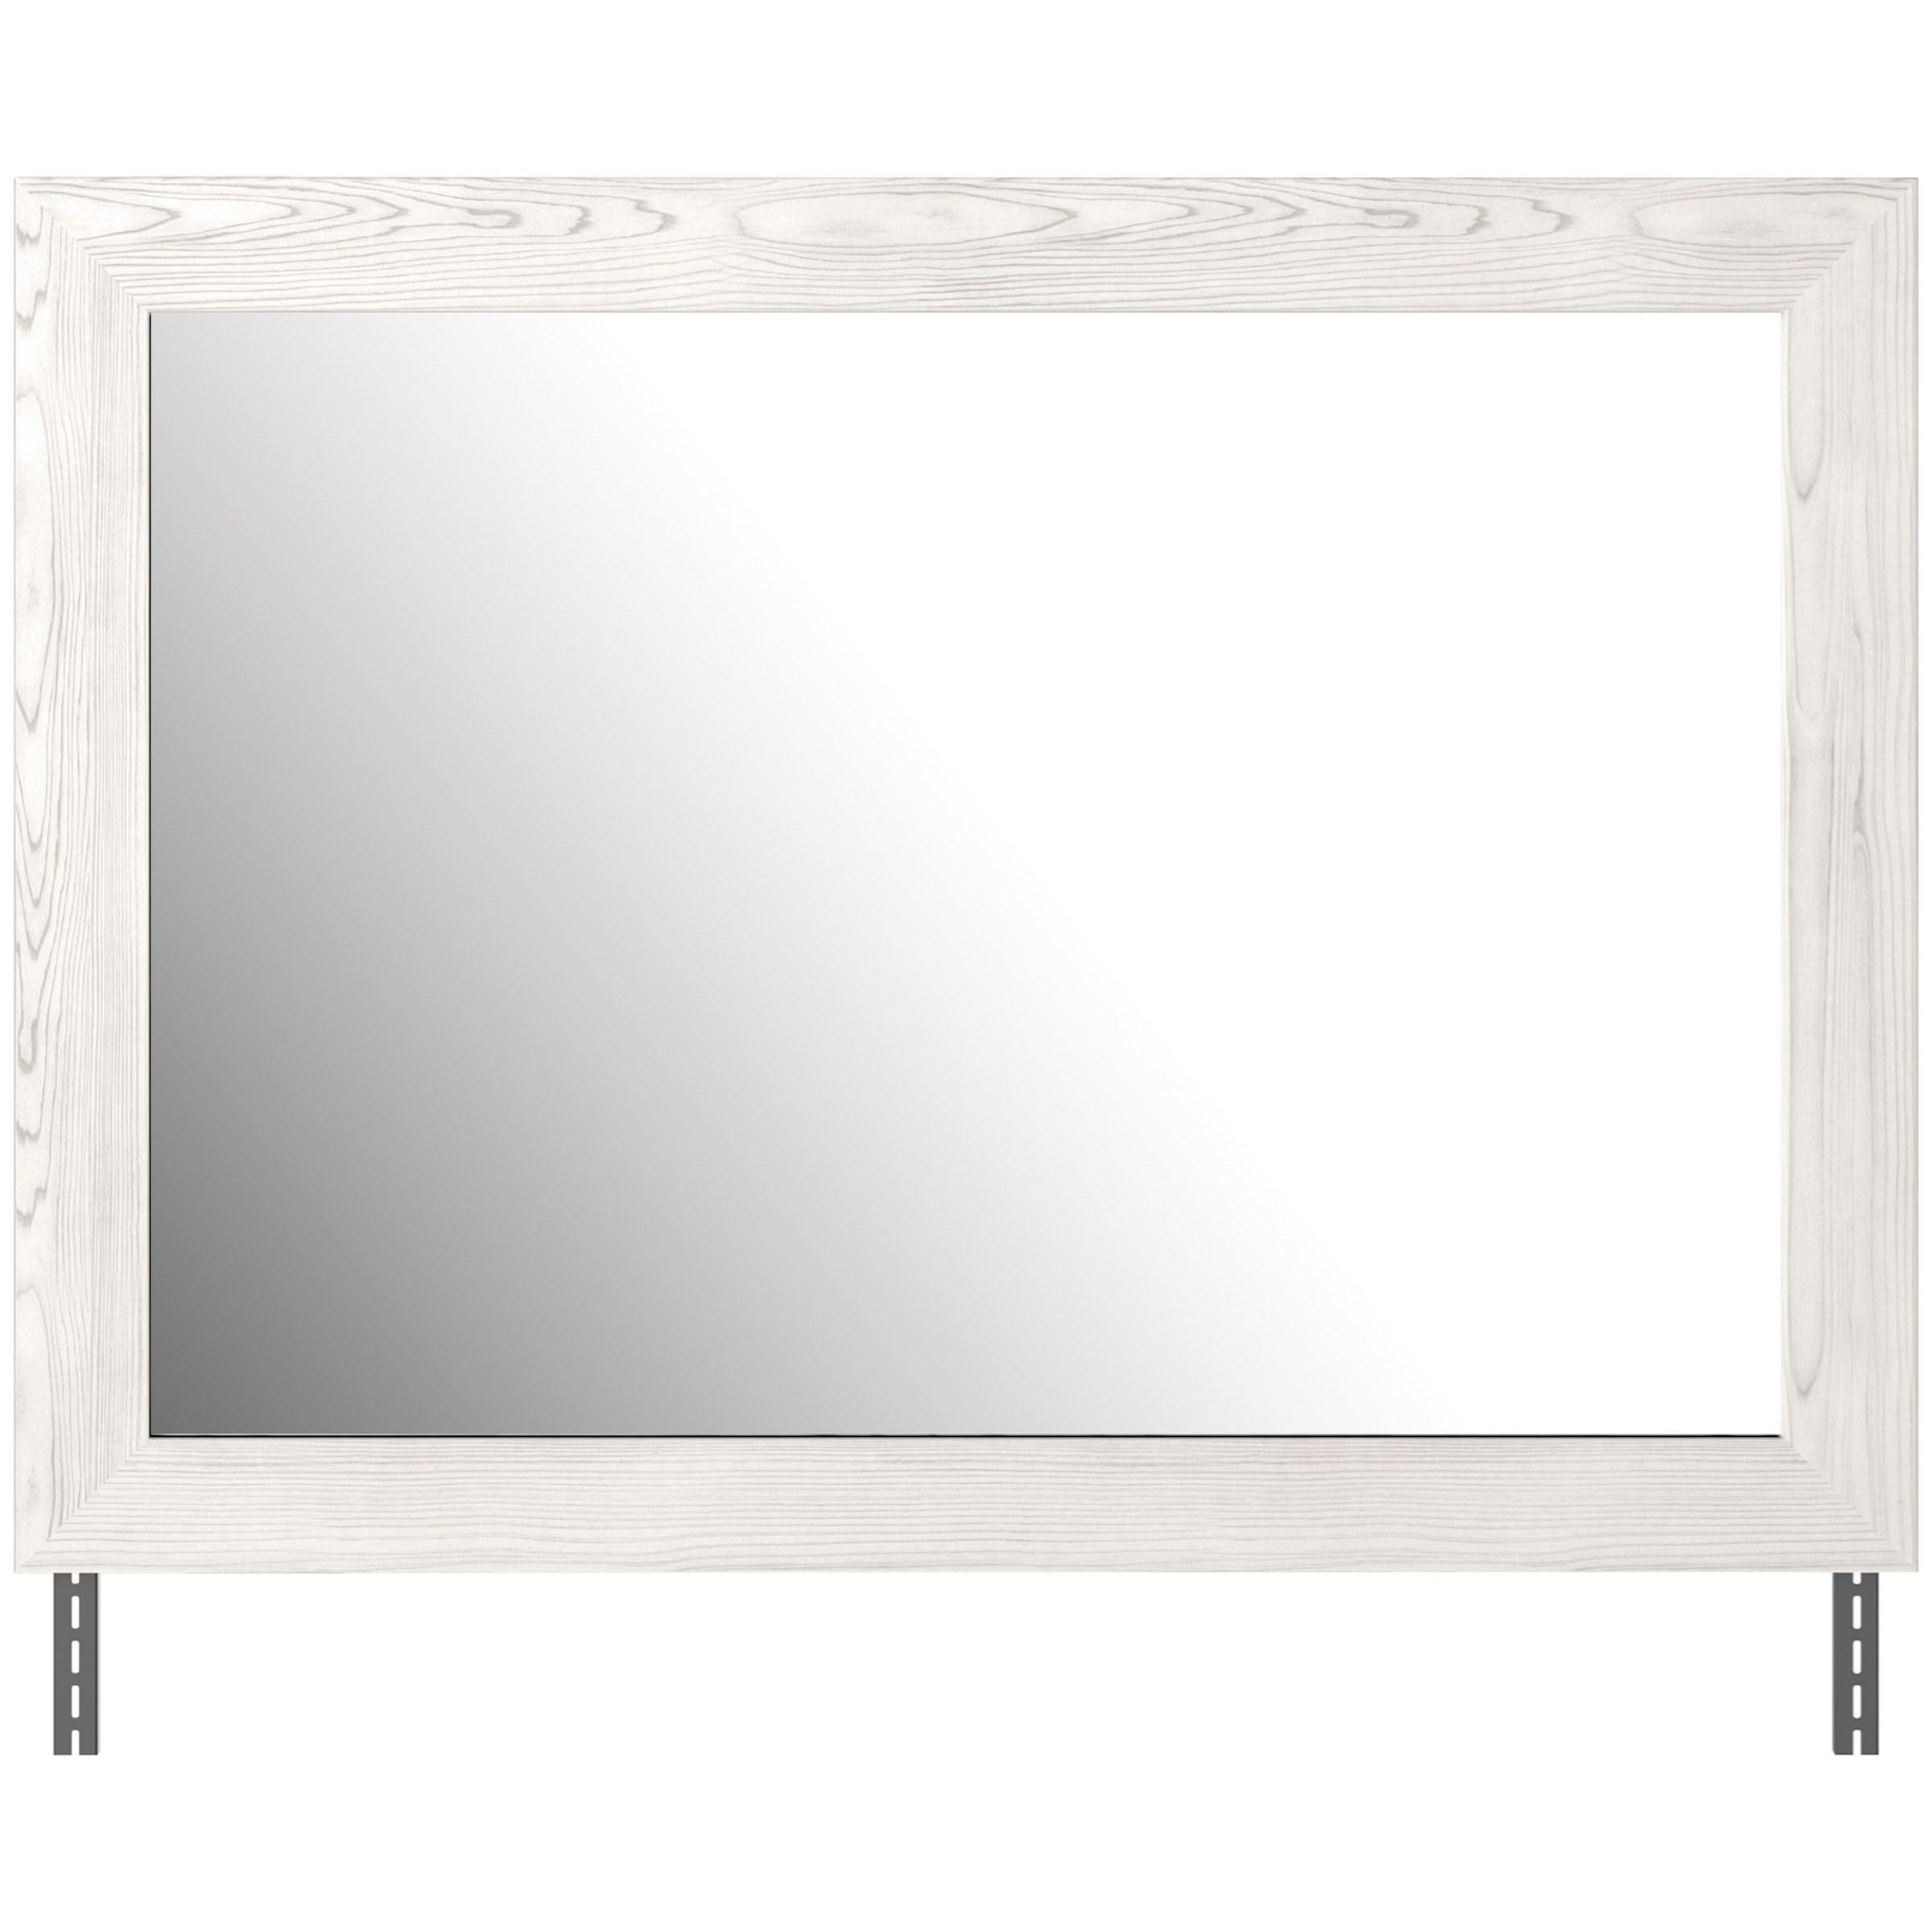 Gerridan Bedroom Mirror by Ashley (Signature Design) at Johnny Janosik